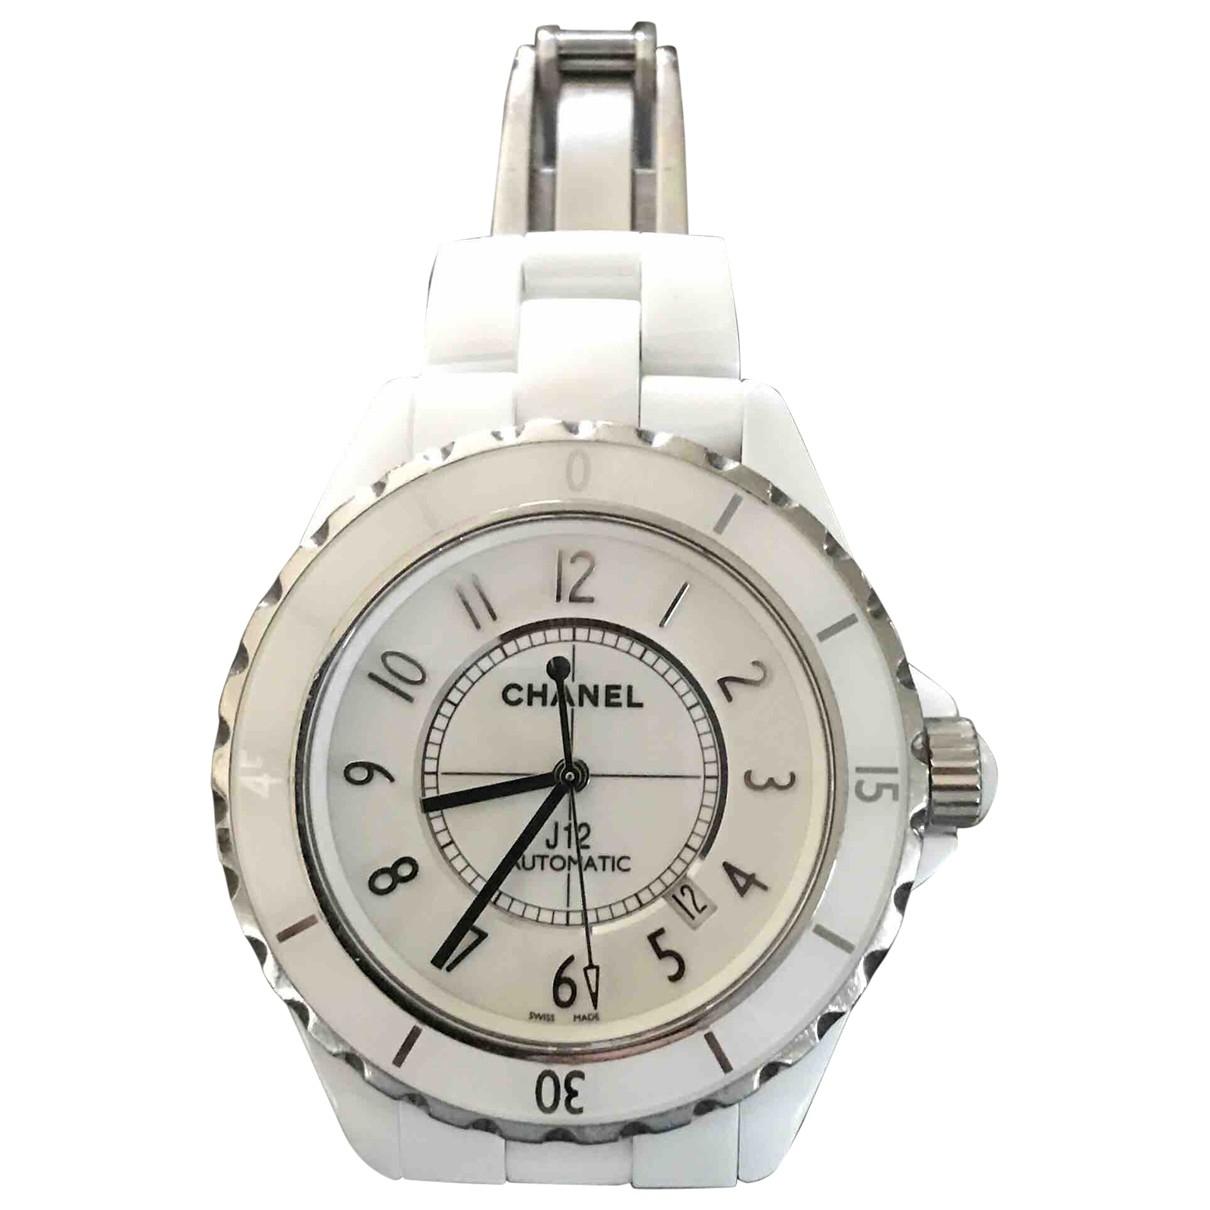 Reloj J12 Automatique Chanel